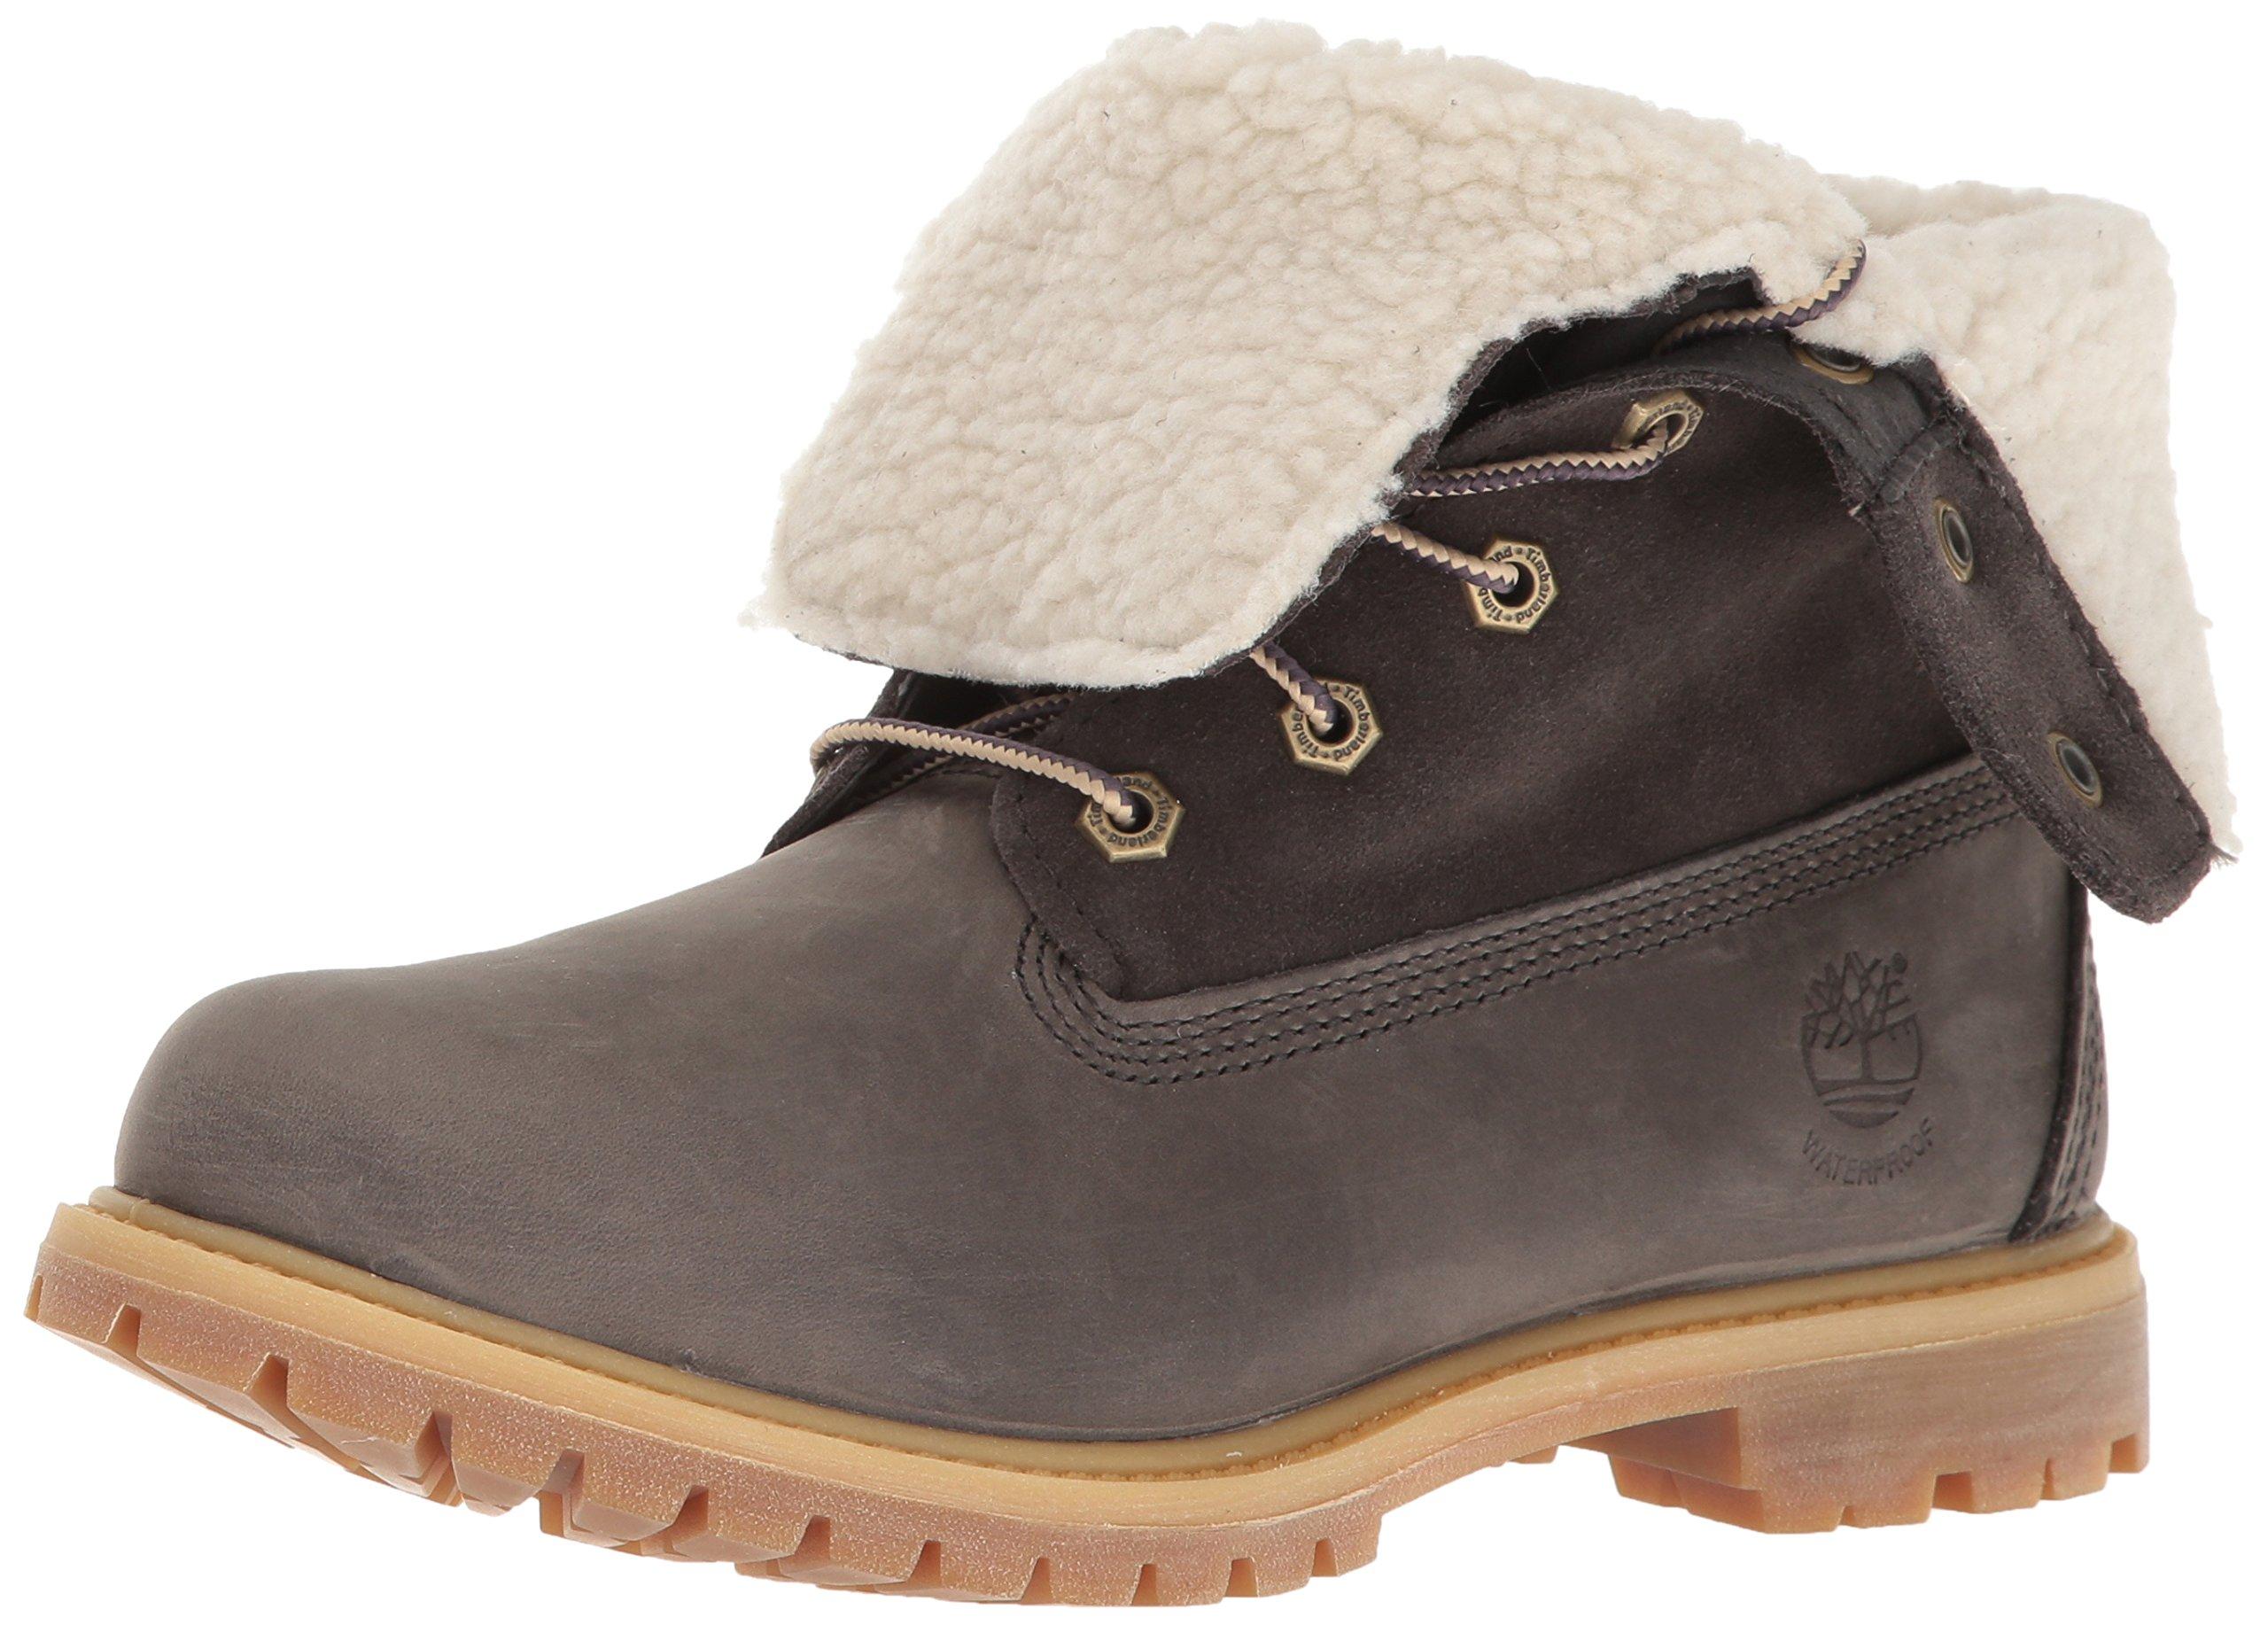 Timberland Women's EK Authentics Teddy Fleece WP Snow Boot,Dark Grey,8 M US